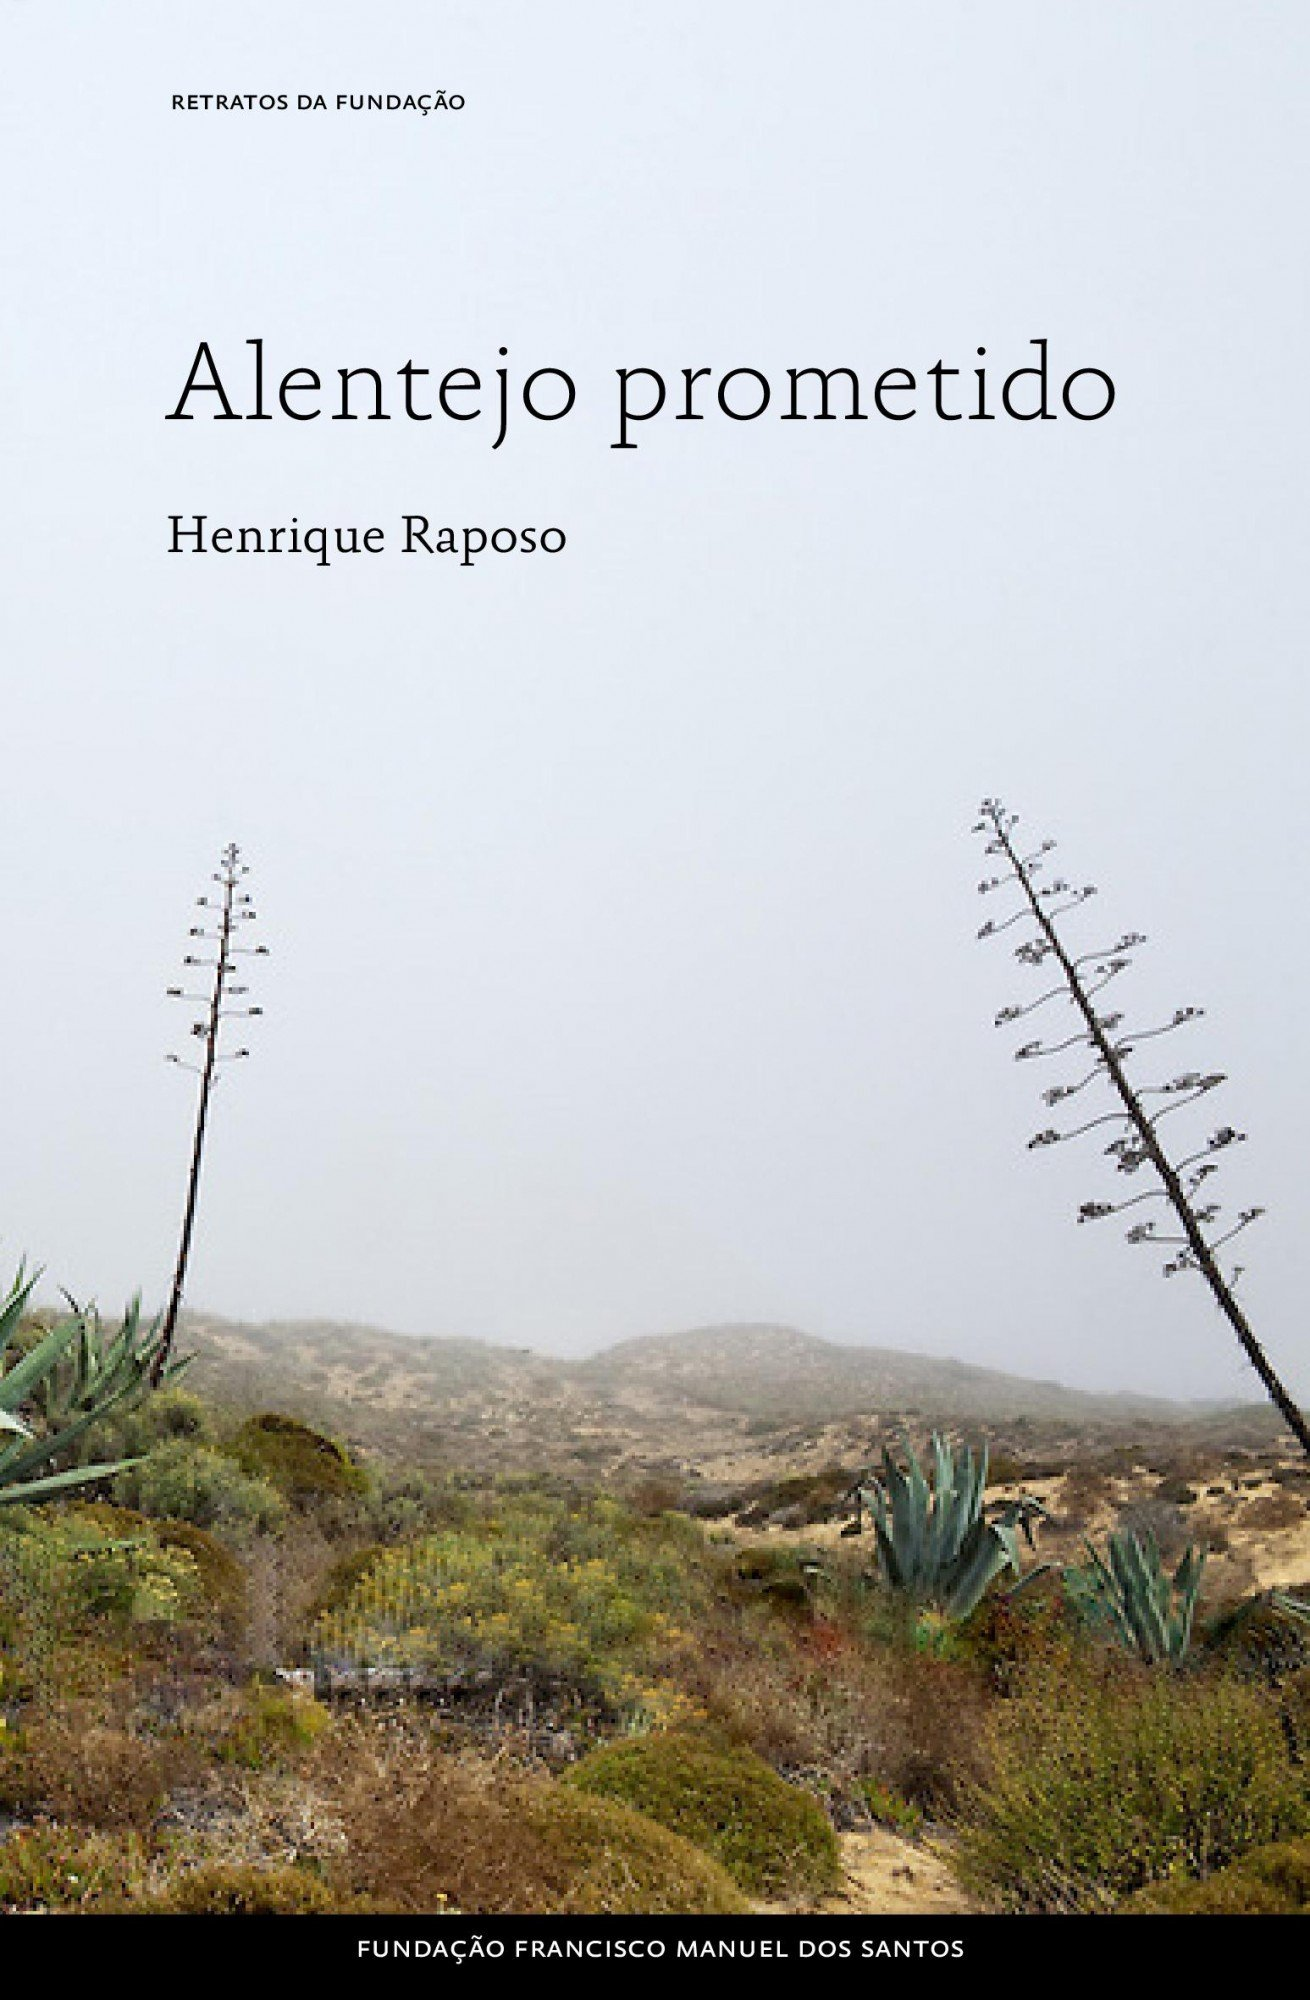 C-frente-ALENTEJOprom-A-page-001